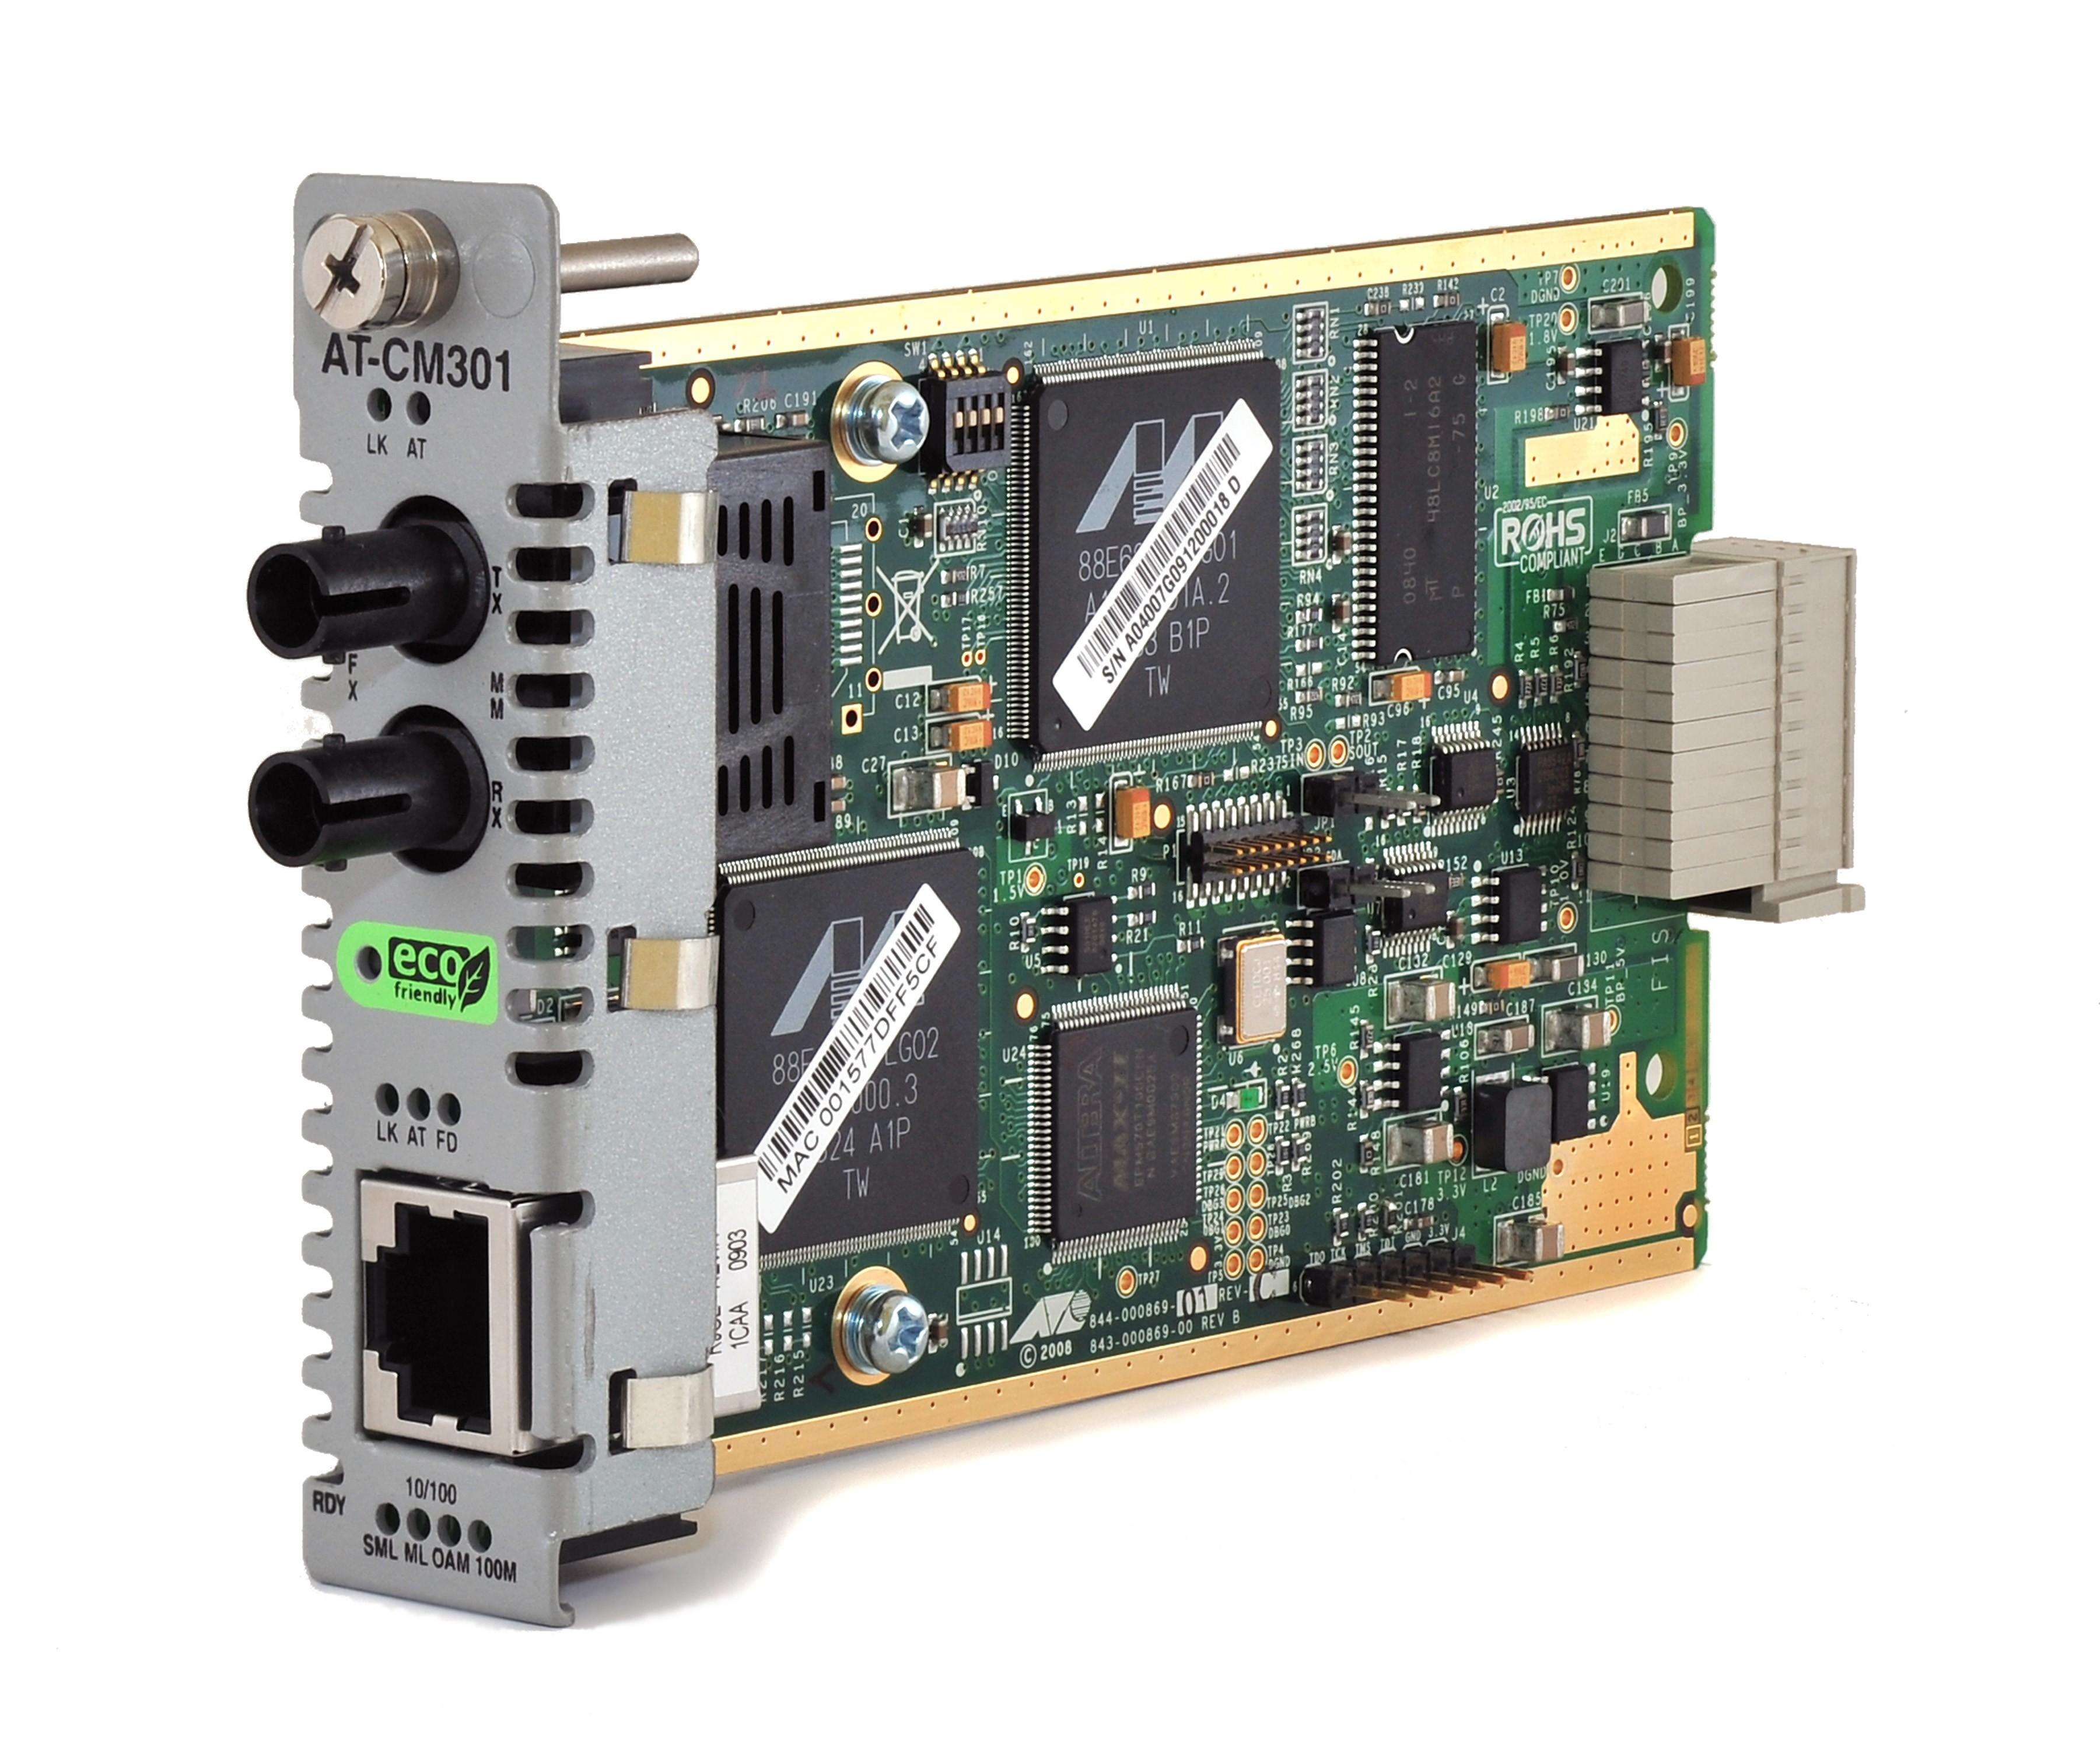 Allied Telesis AT-CM301 100Mb Copper / Fibre Multi Mode